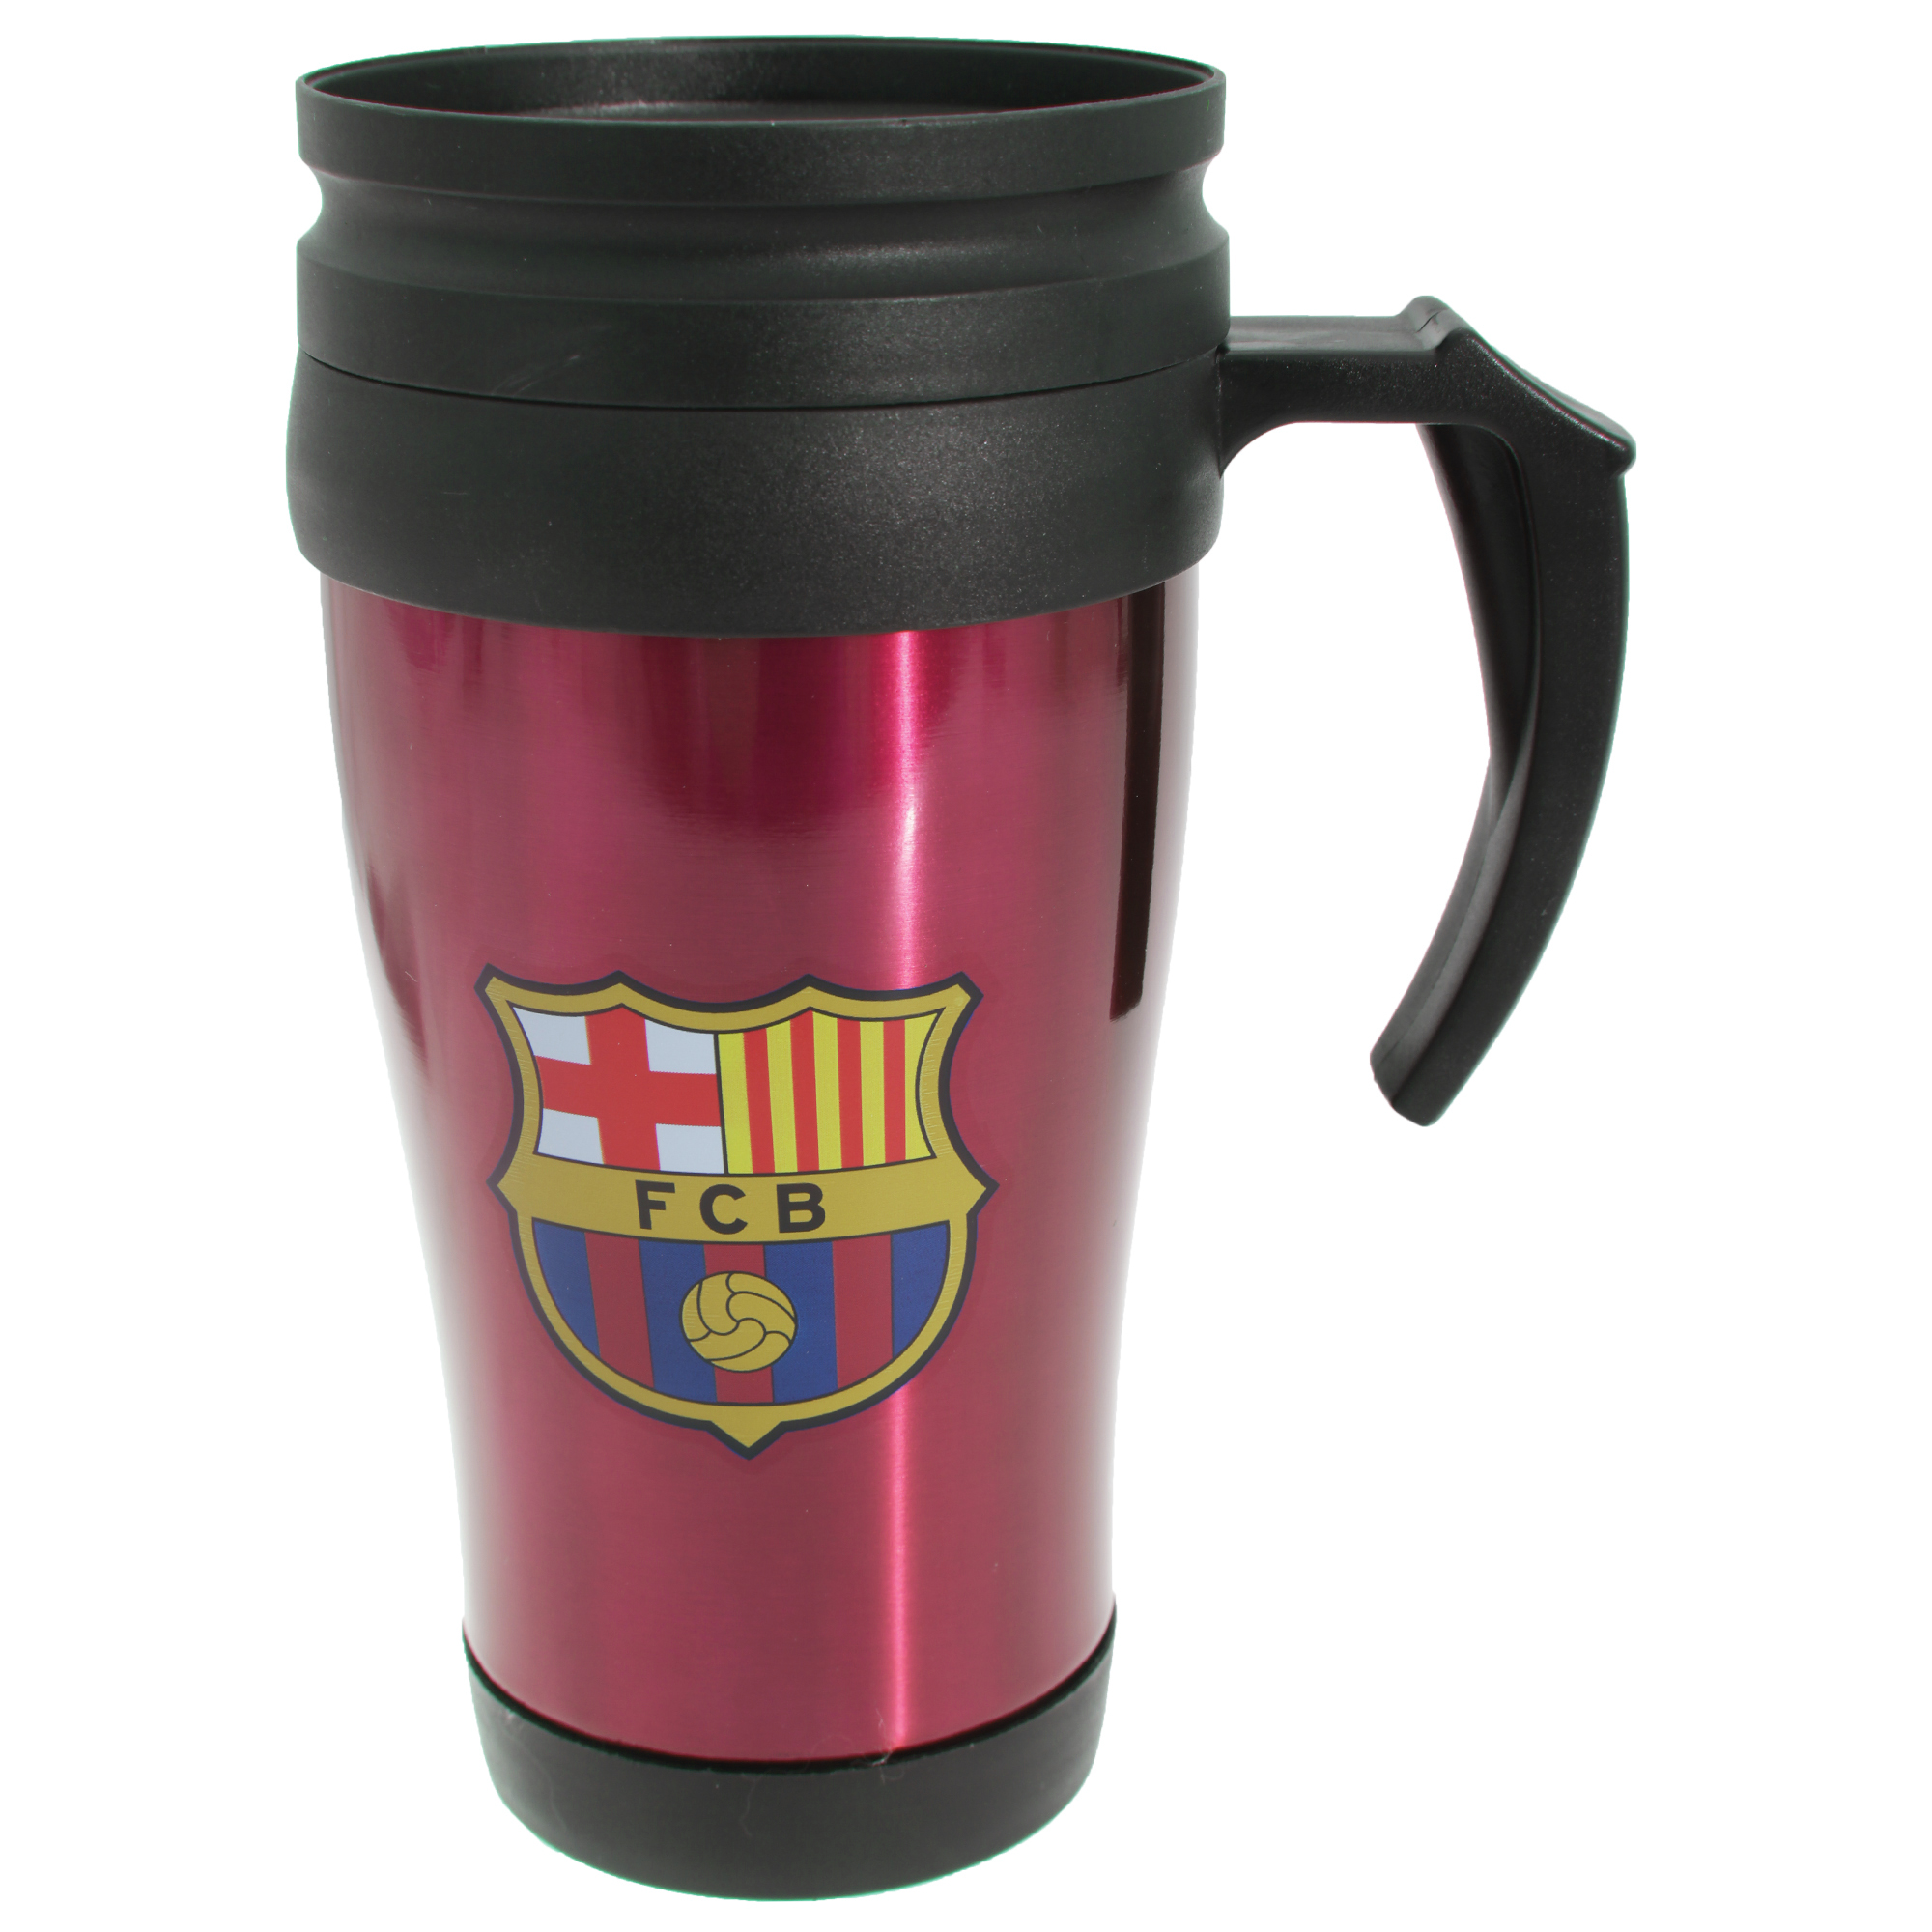 Fc Barcelona Travel Mug